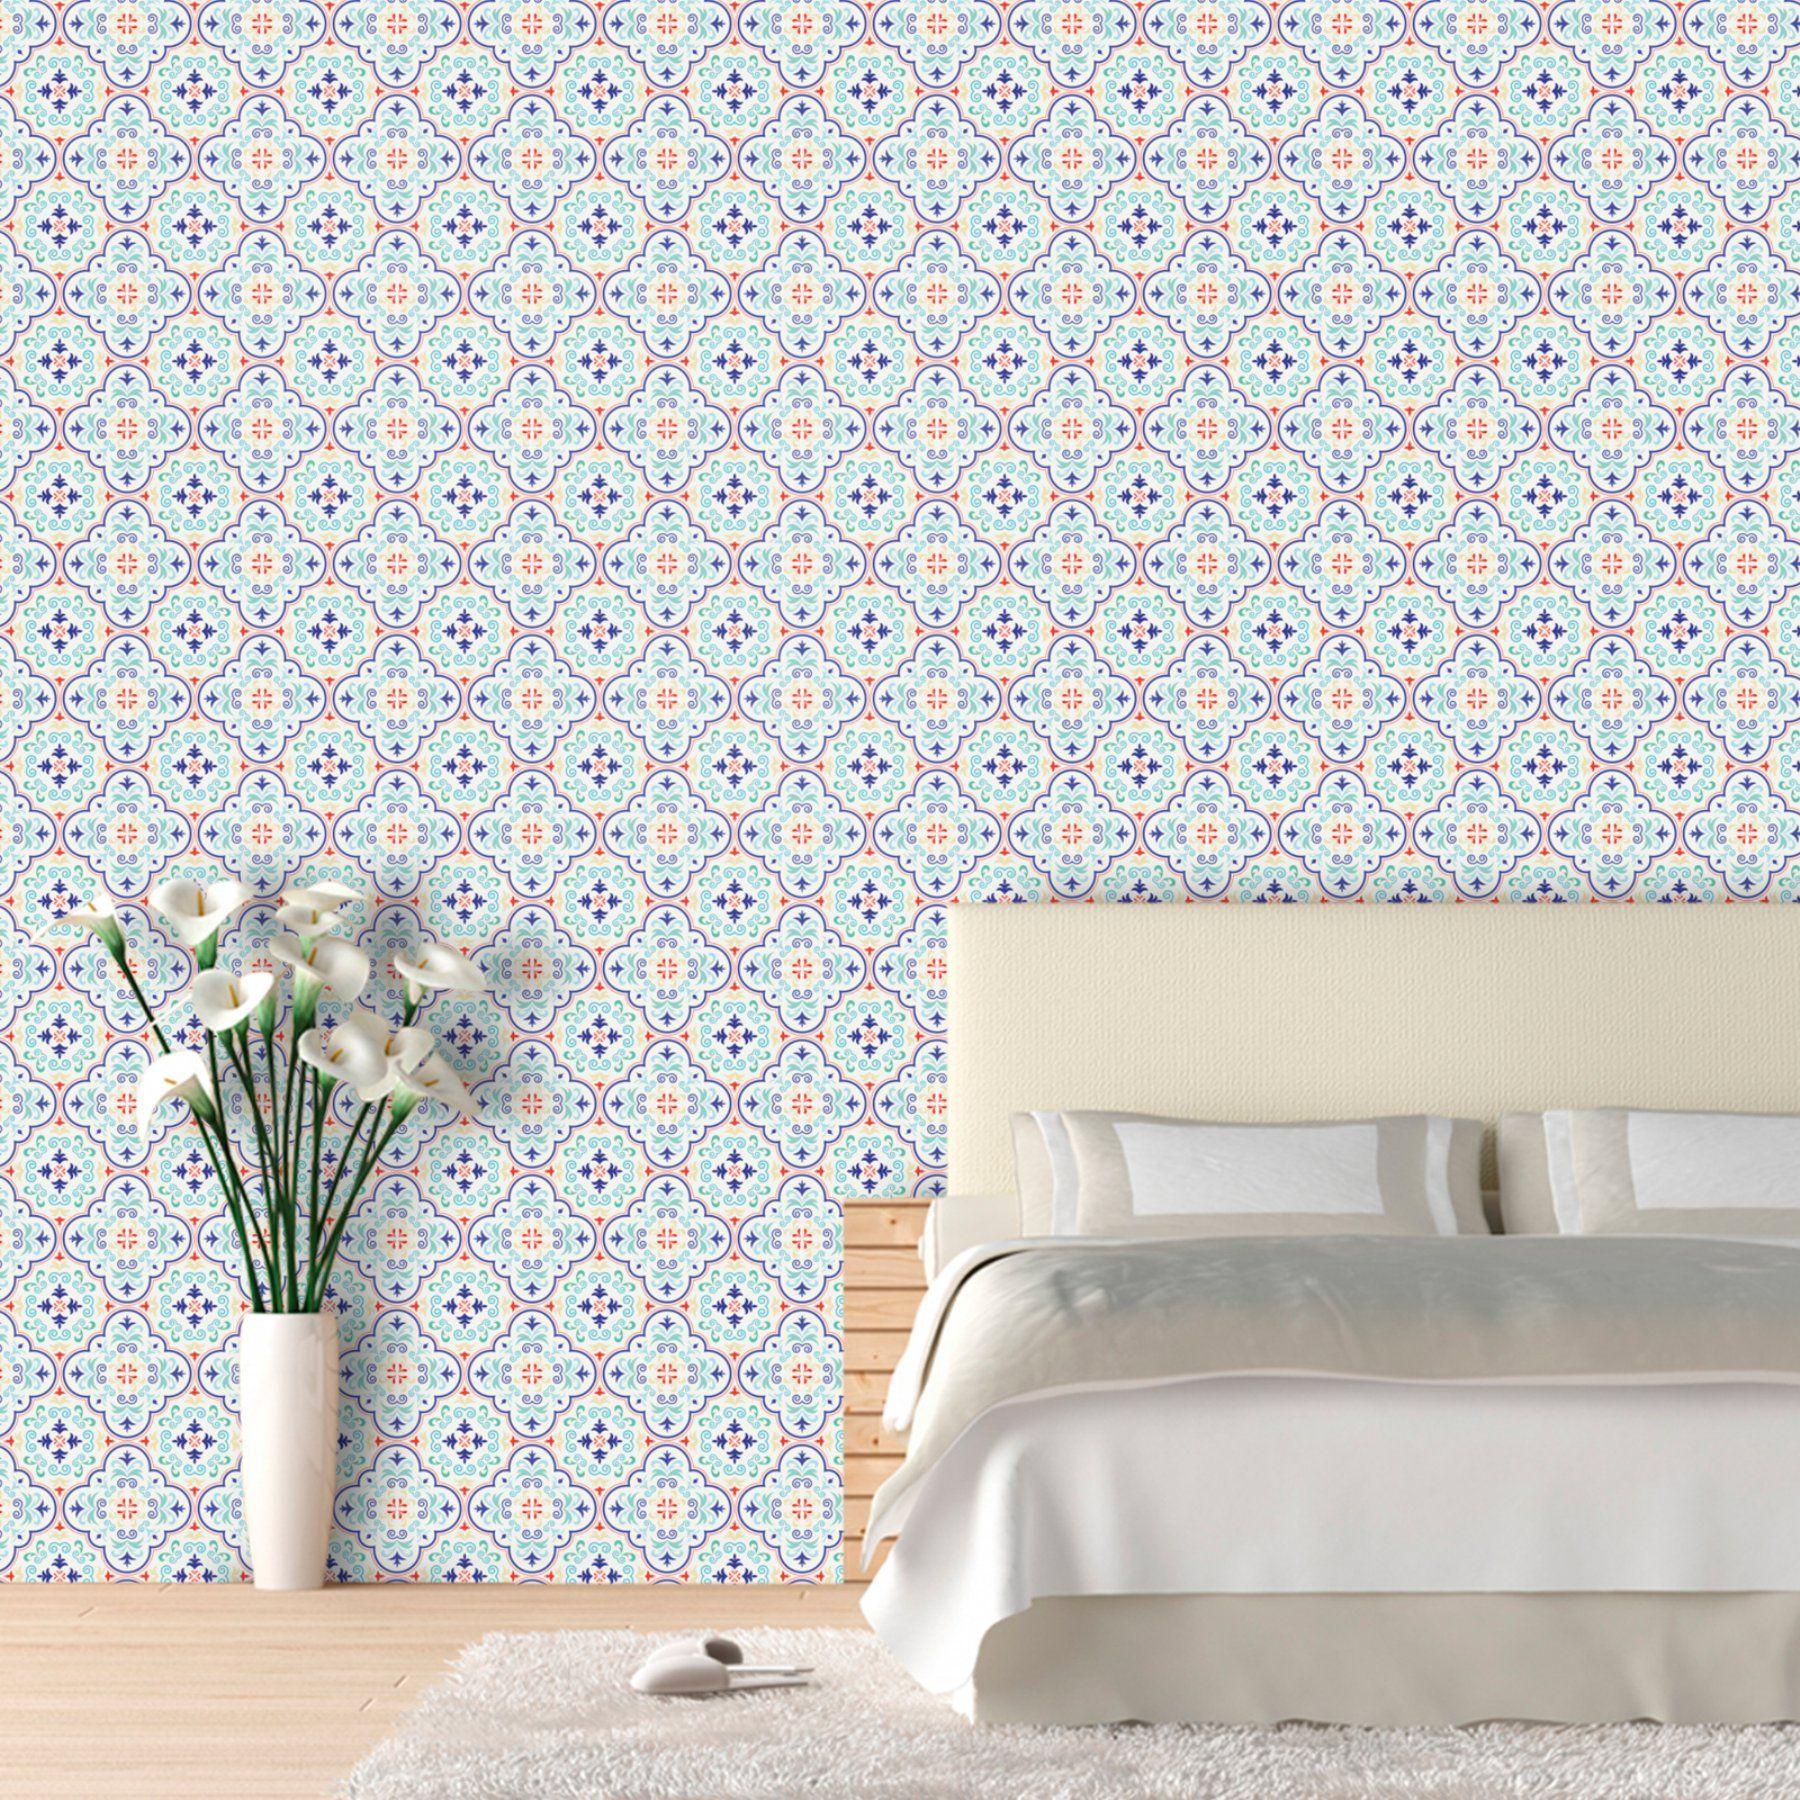 Swag Paper Tiles SelfAdhesive Wallpaper TILESFIEST4